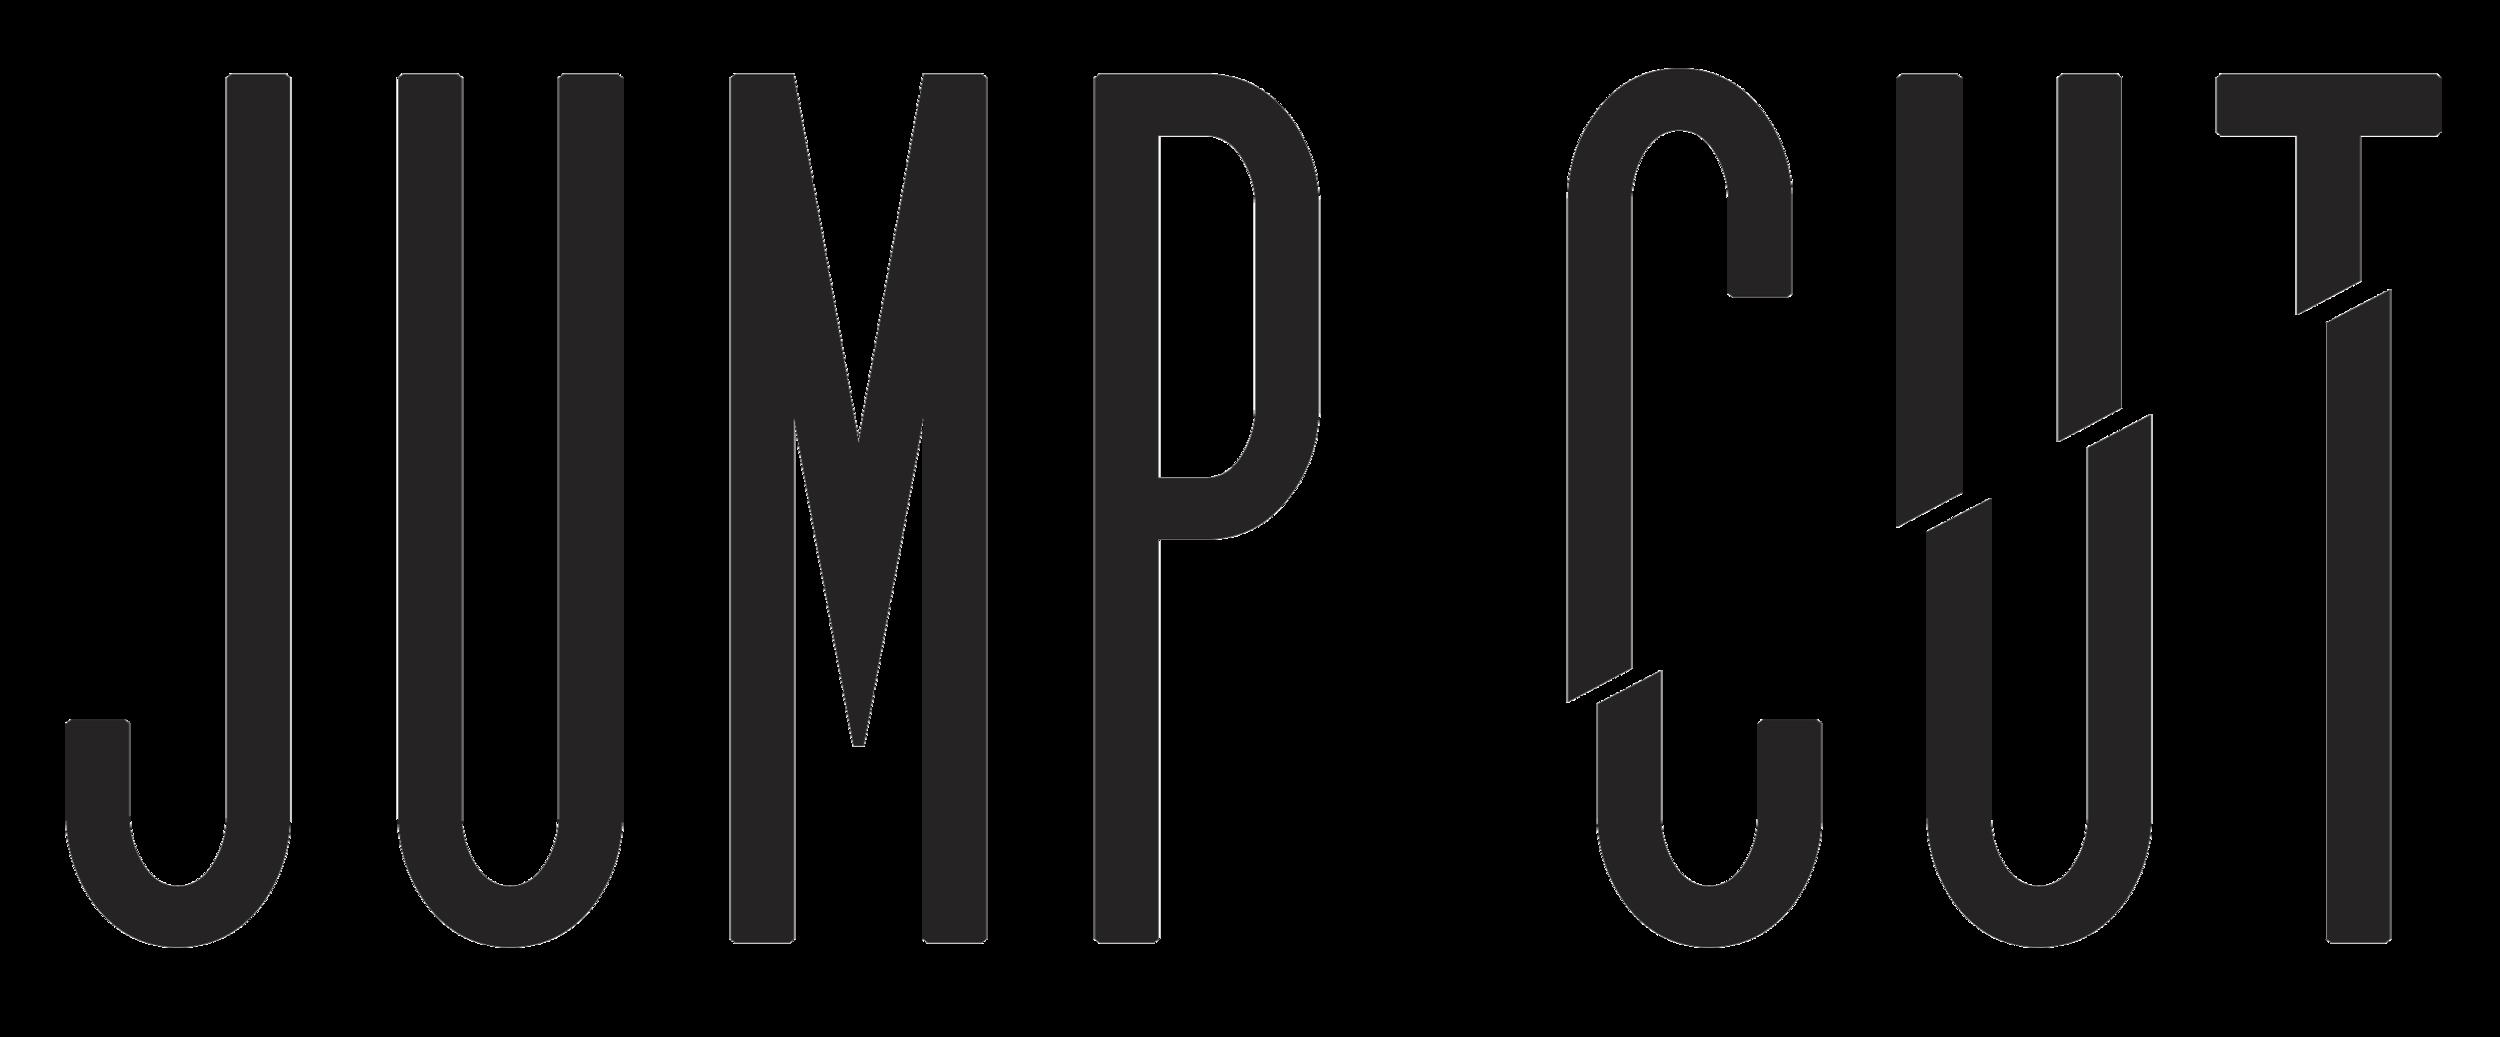 jumpcut_trasparente_nero.png